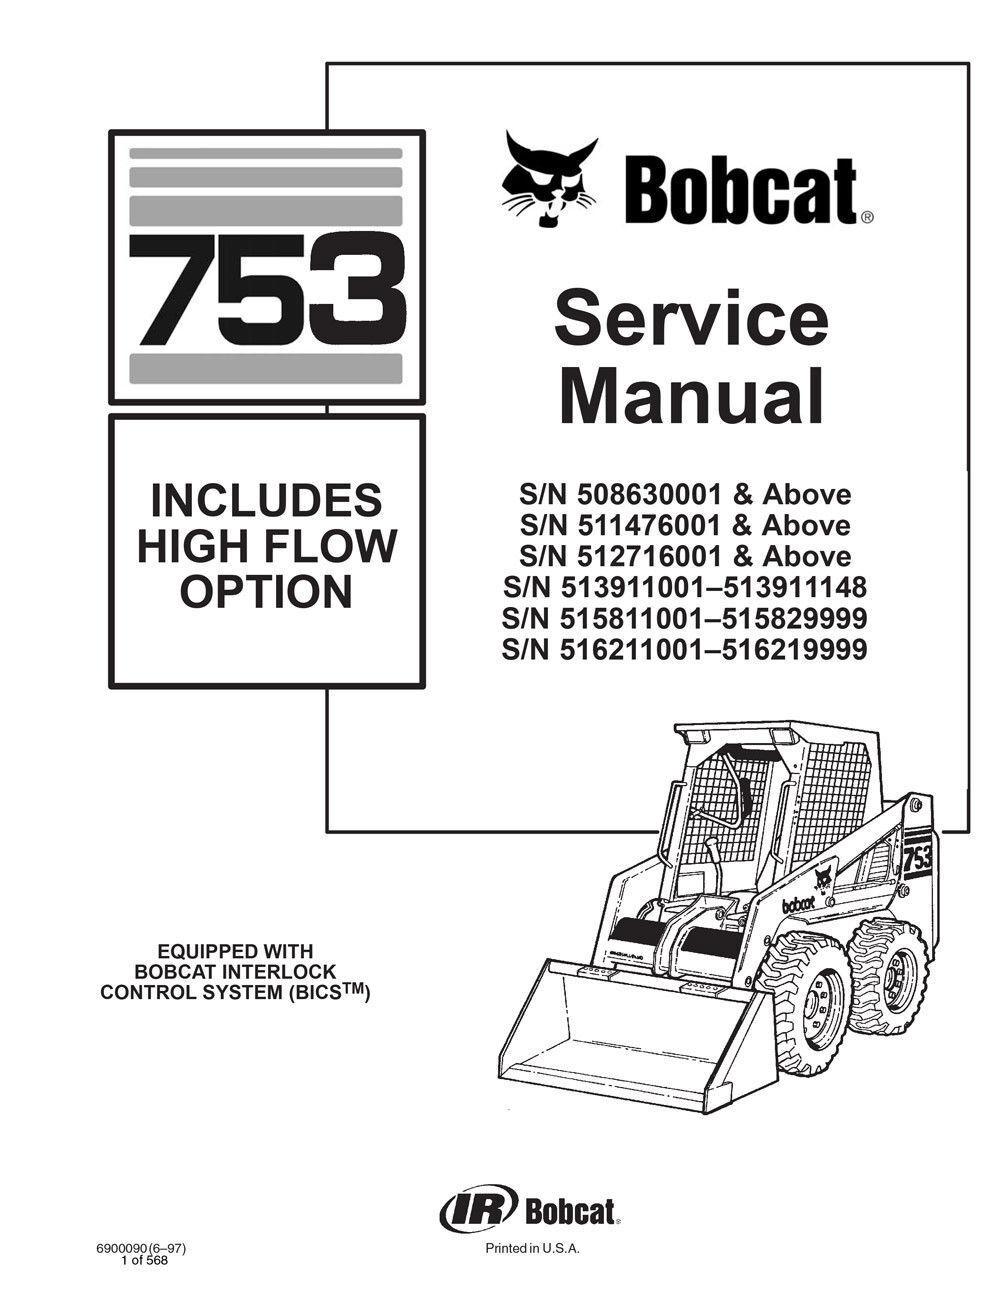 Bobcat 753 Skid Steer Manual 2019 Ebook Library